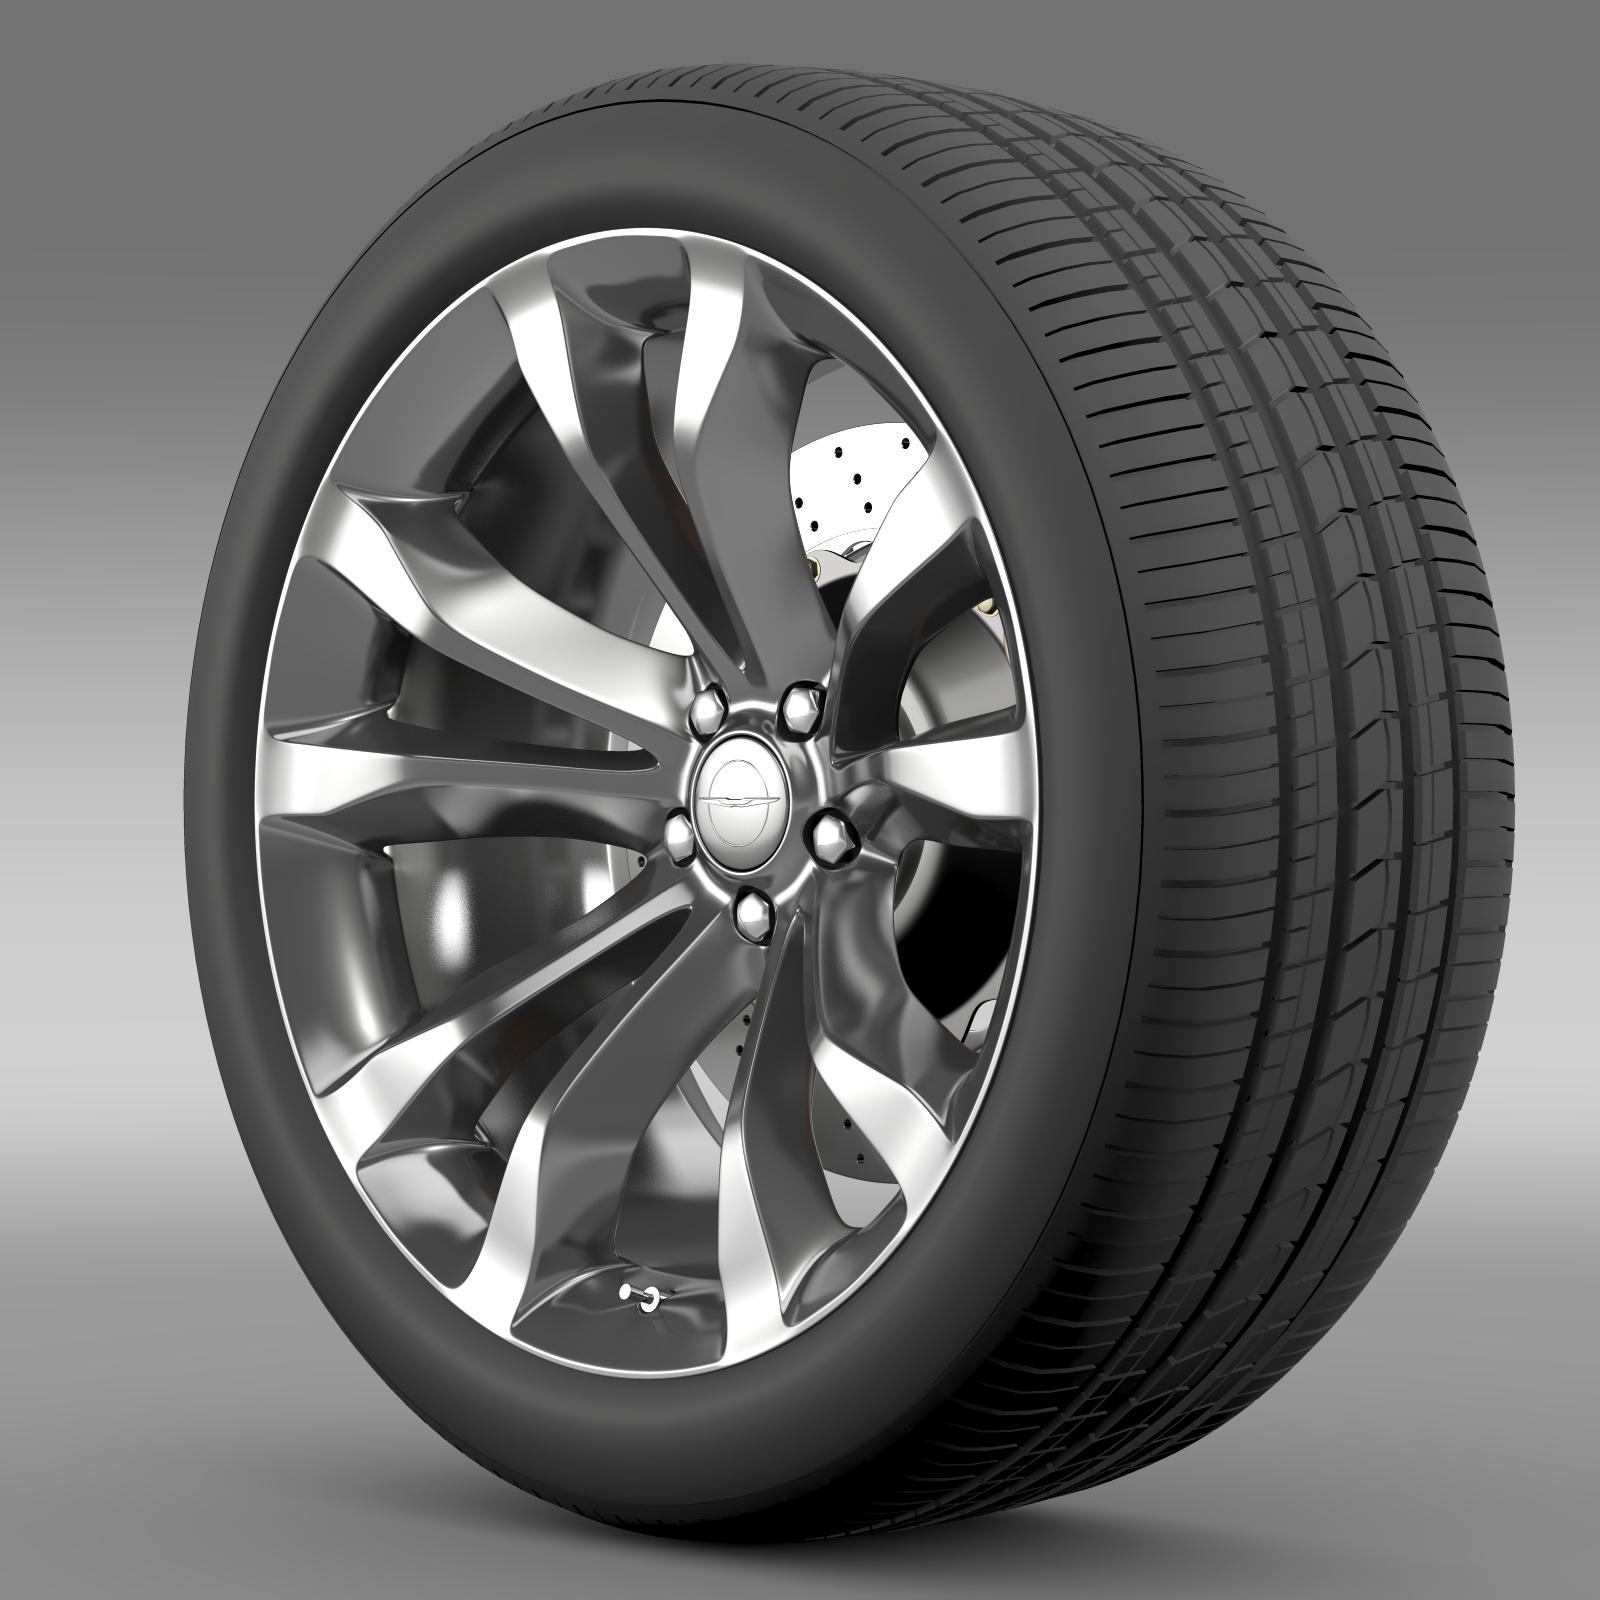 Chrysler 300C Platinum 2015 wheel 3d model 3ds max fbx c4d lwo lws lw ma mb  obj 212776